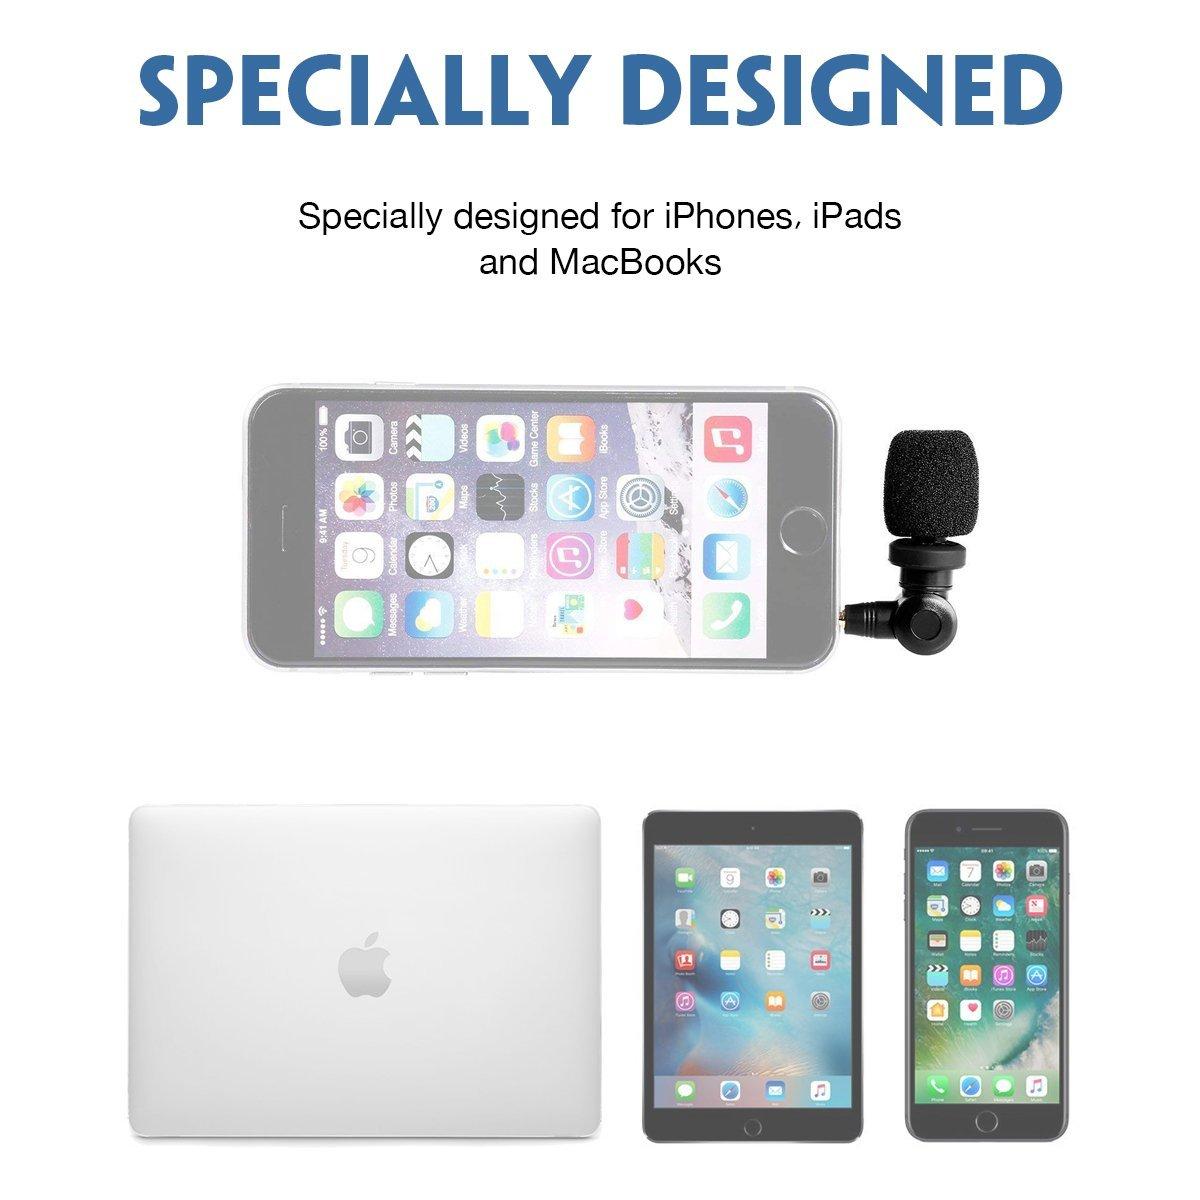 iPhone 8 7 Plus 6 Plus iPod iPad Saramonic SmartMic Mini Flexible Condenser Microphone with High Sensitivity for Apple IOS Devices i.e